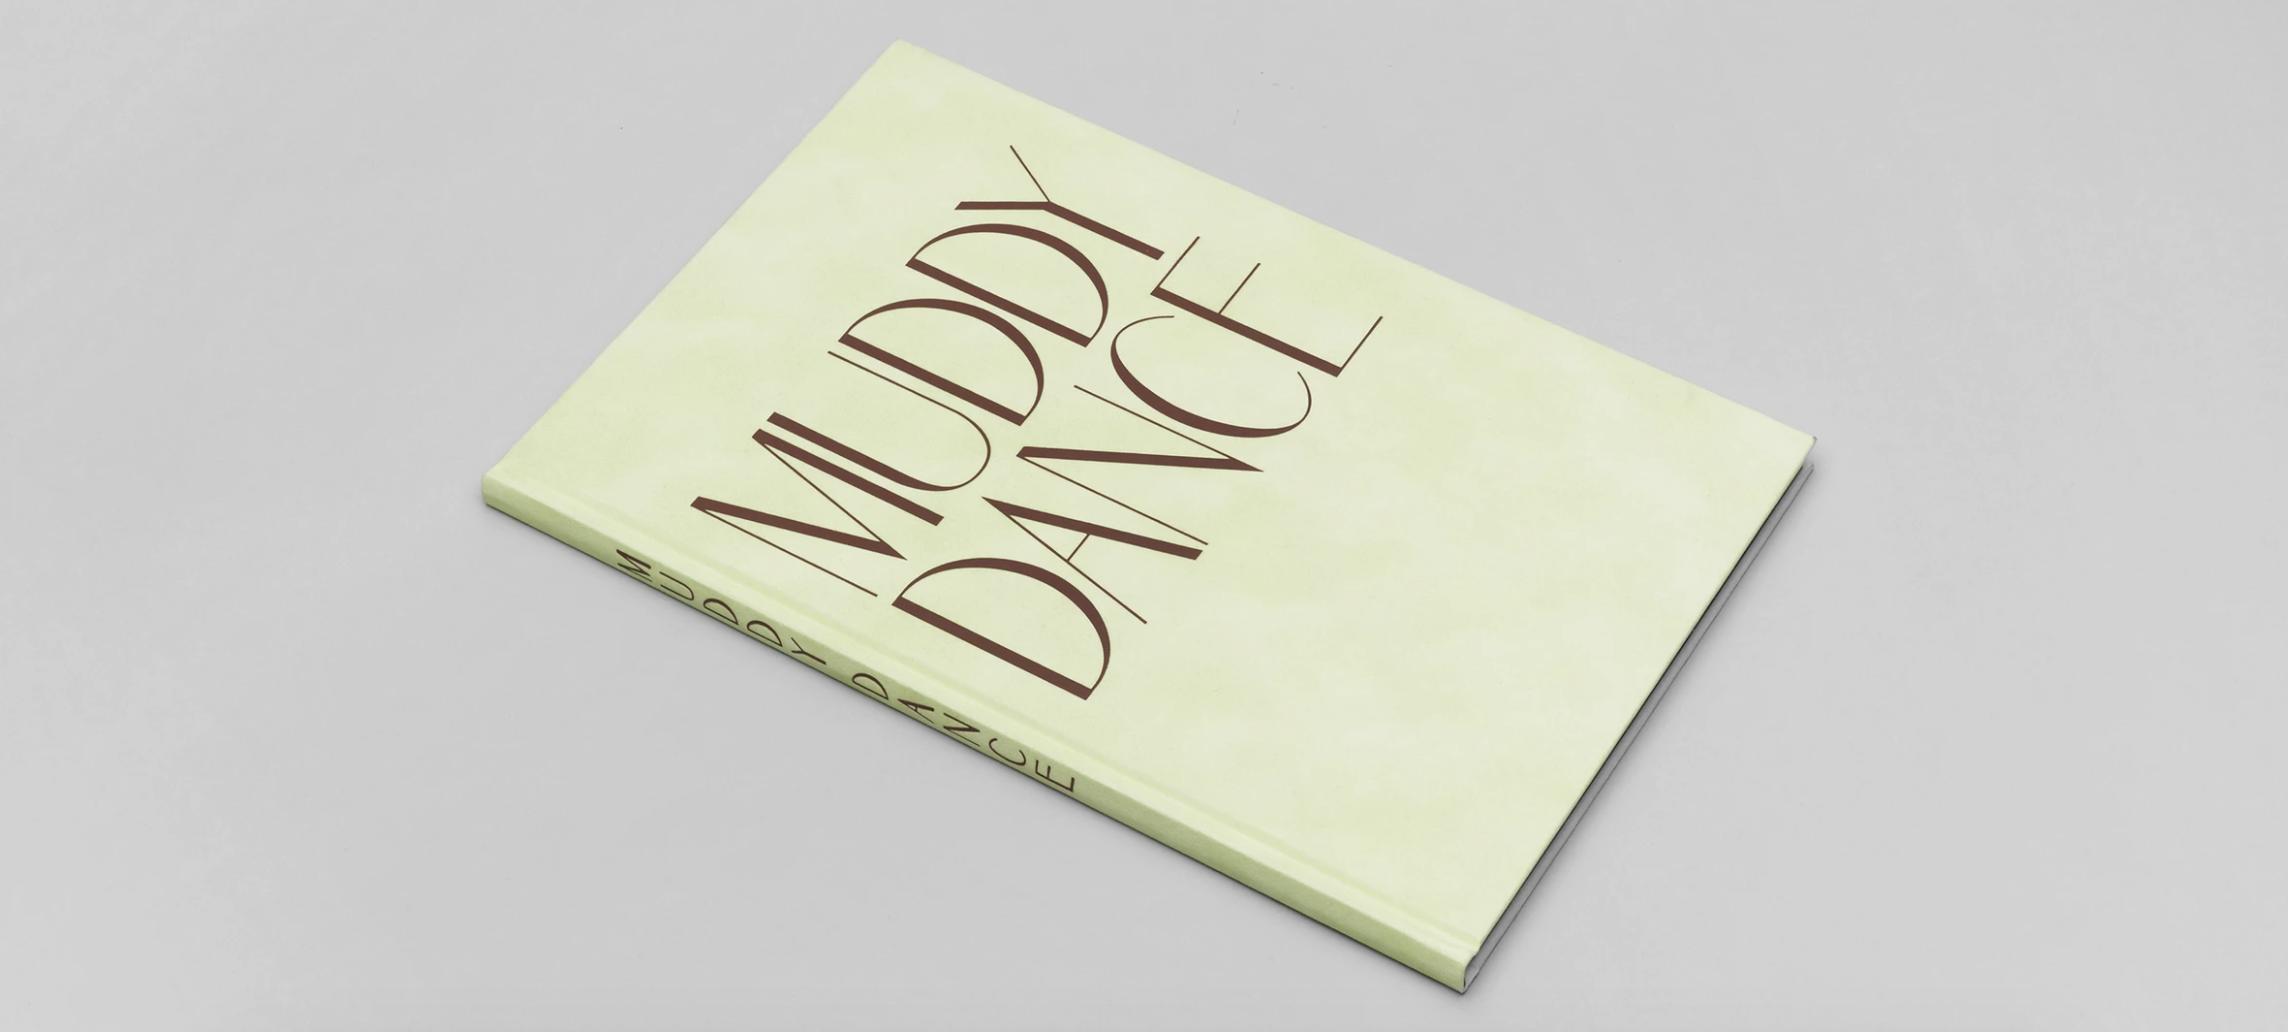 Erik Kessels,MUDDY DANCE RVB books